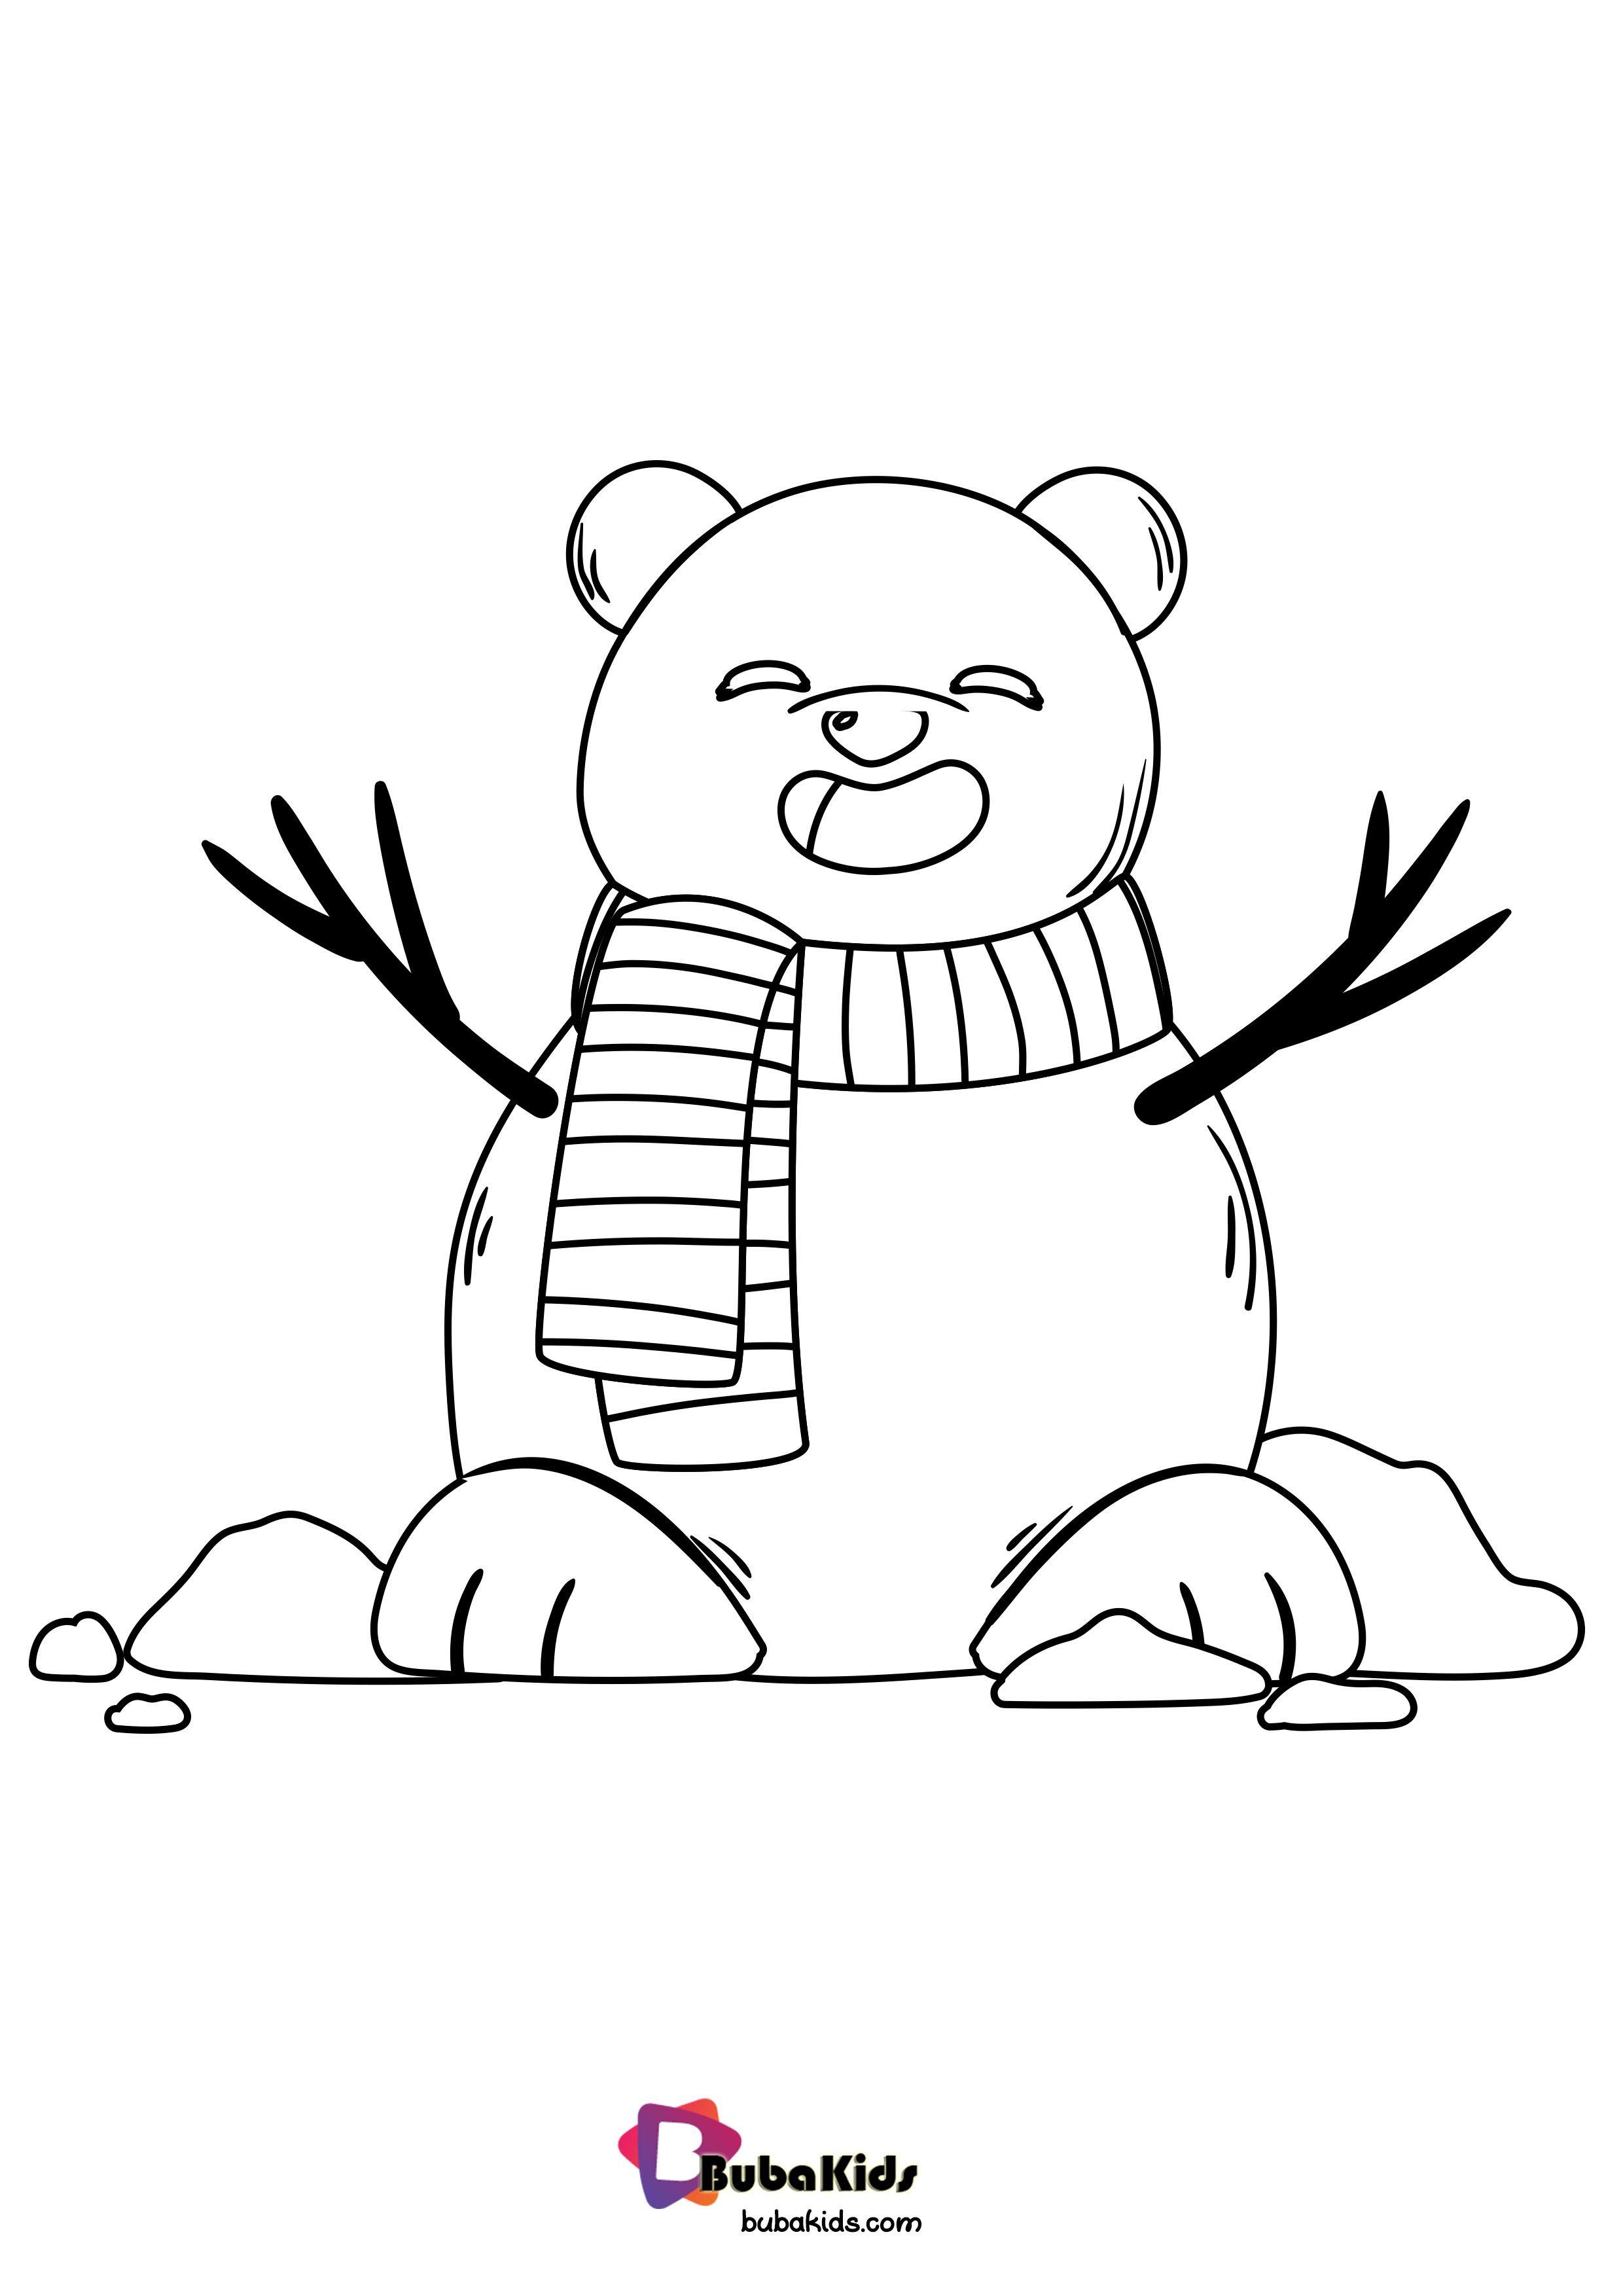 bearcoloring, snowmancoloringpage Bearcoloring,